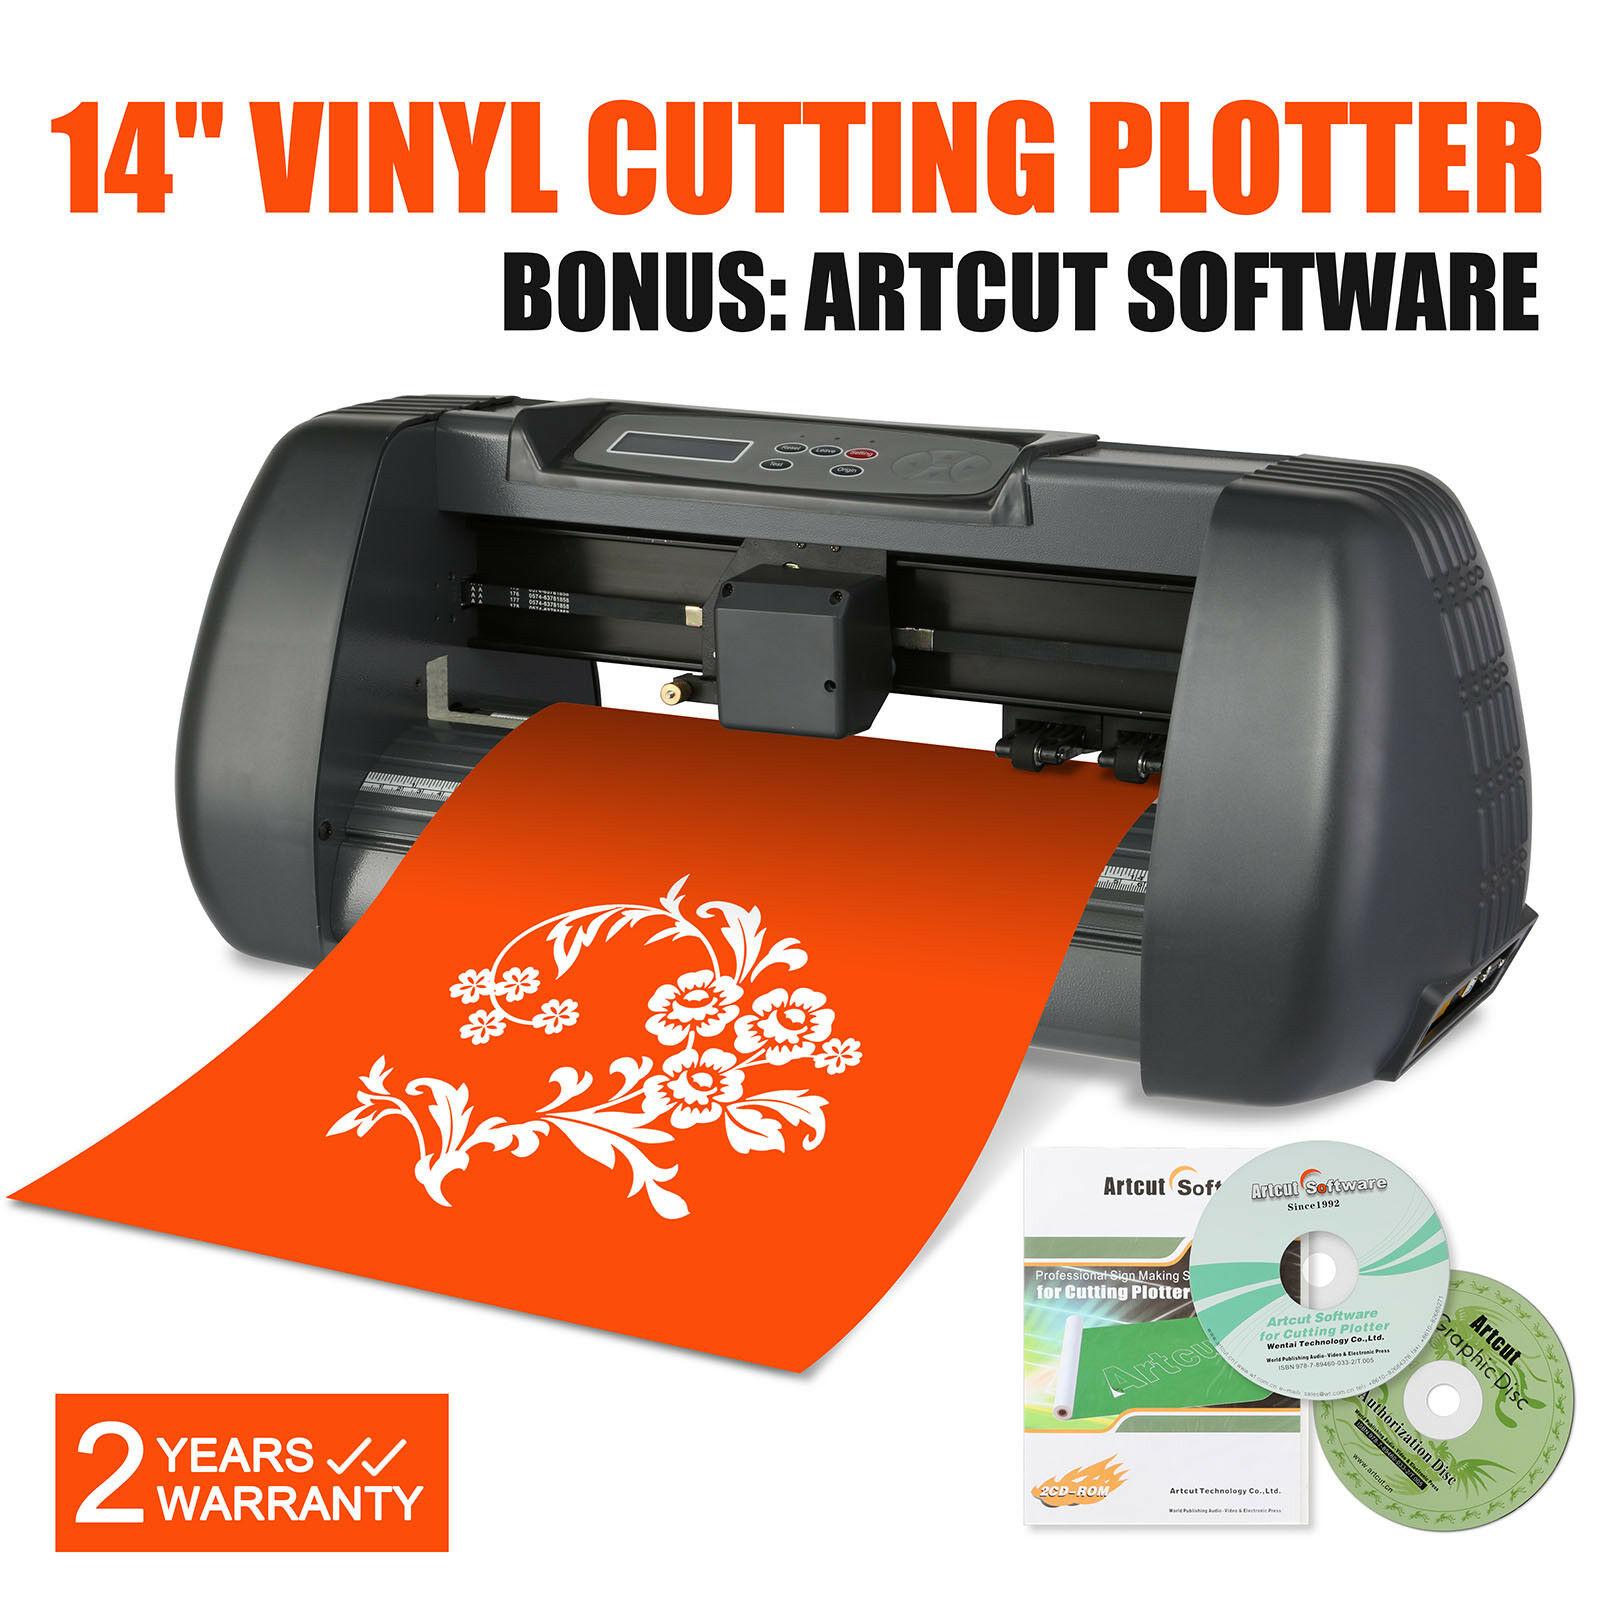 Vinyl Cutting Plotter 14